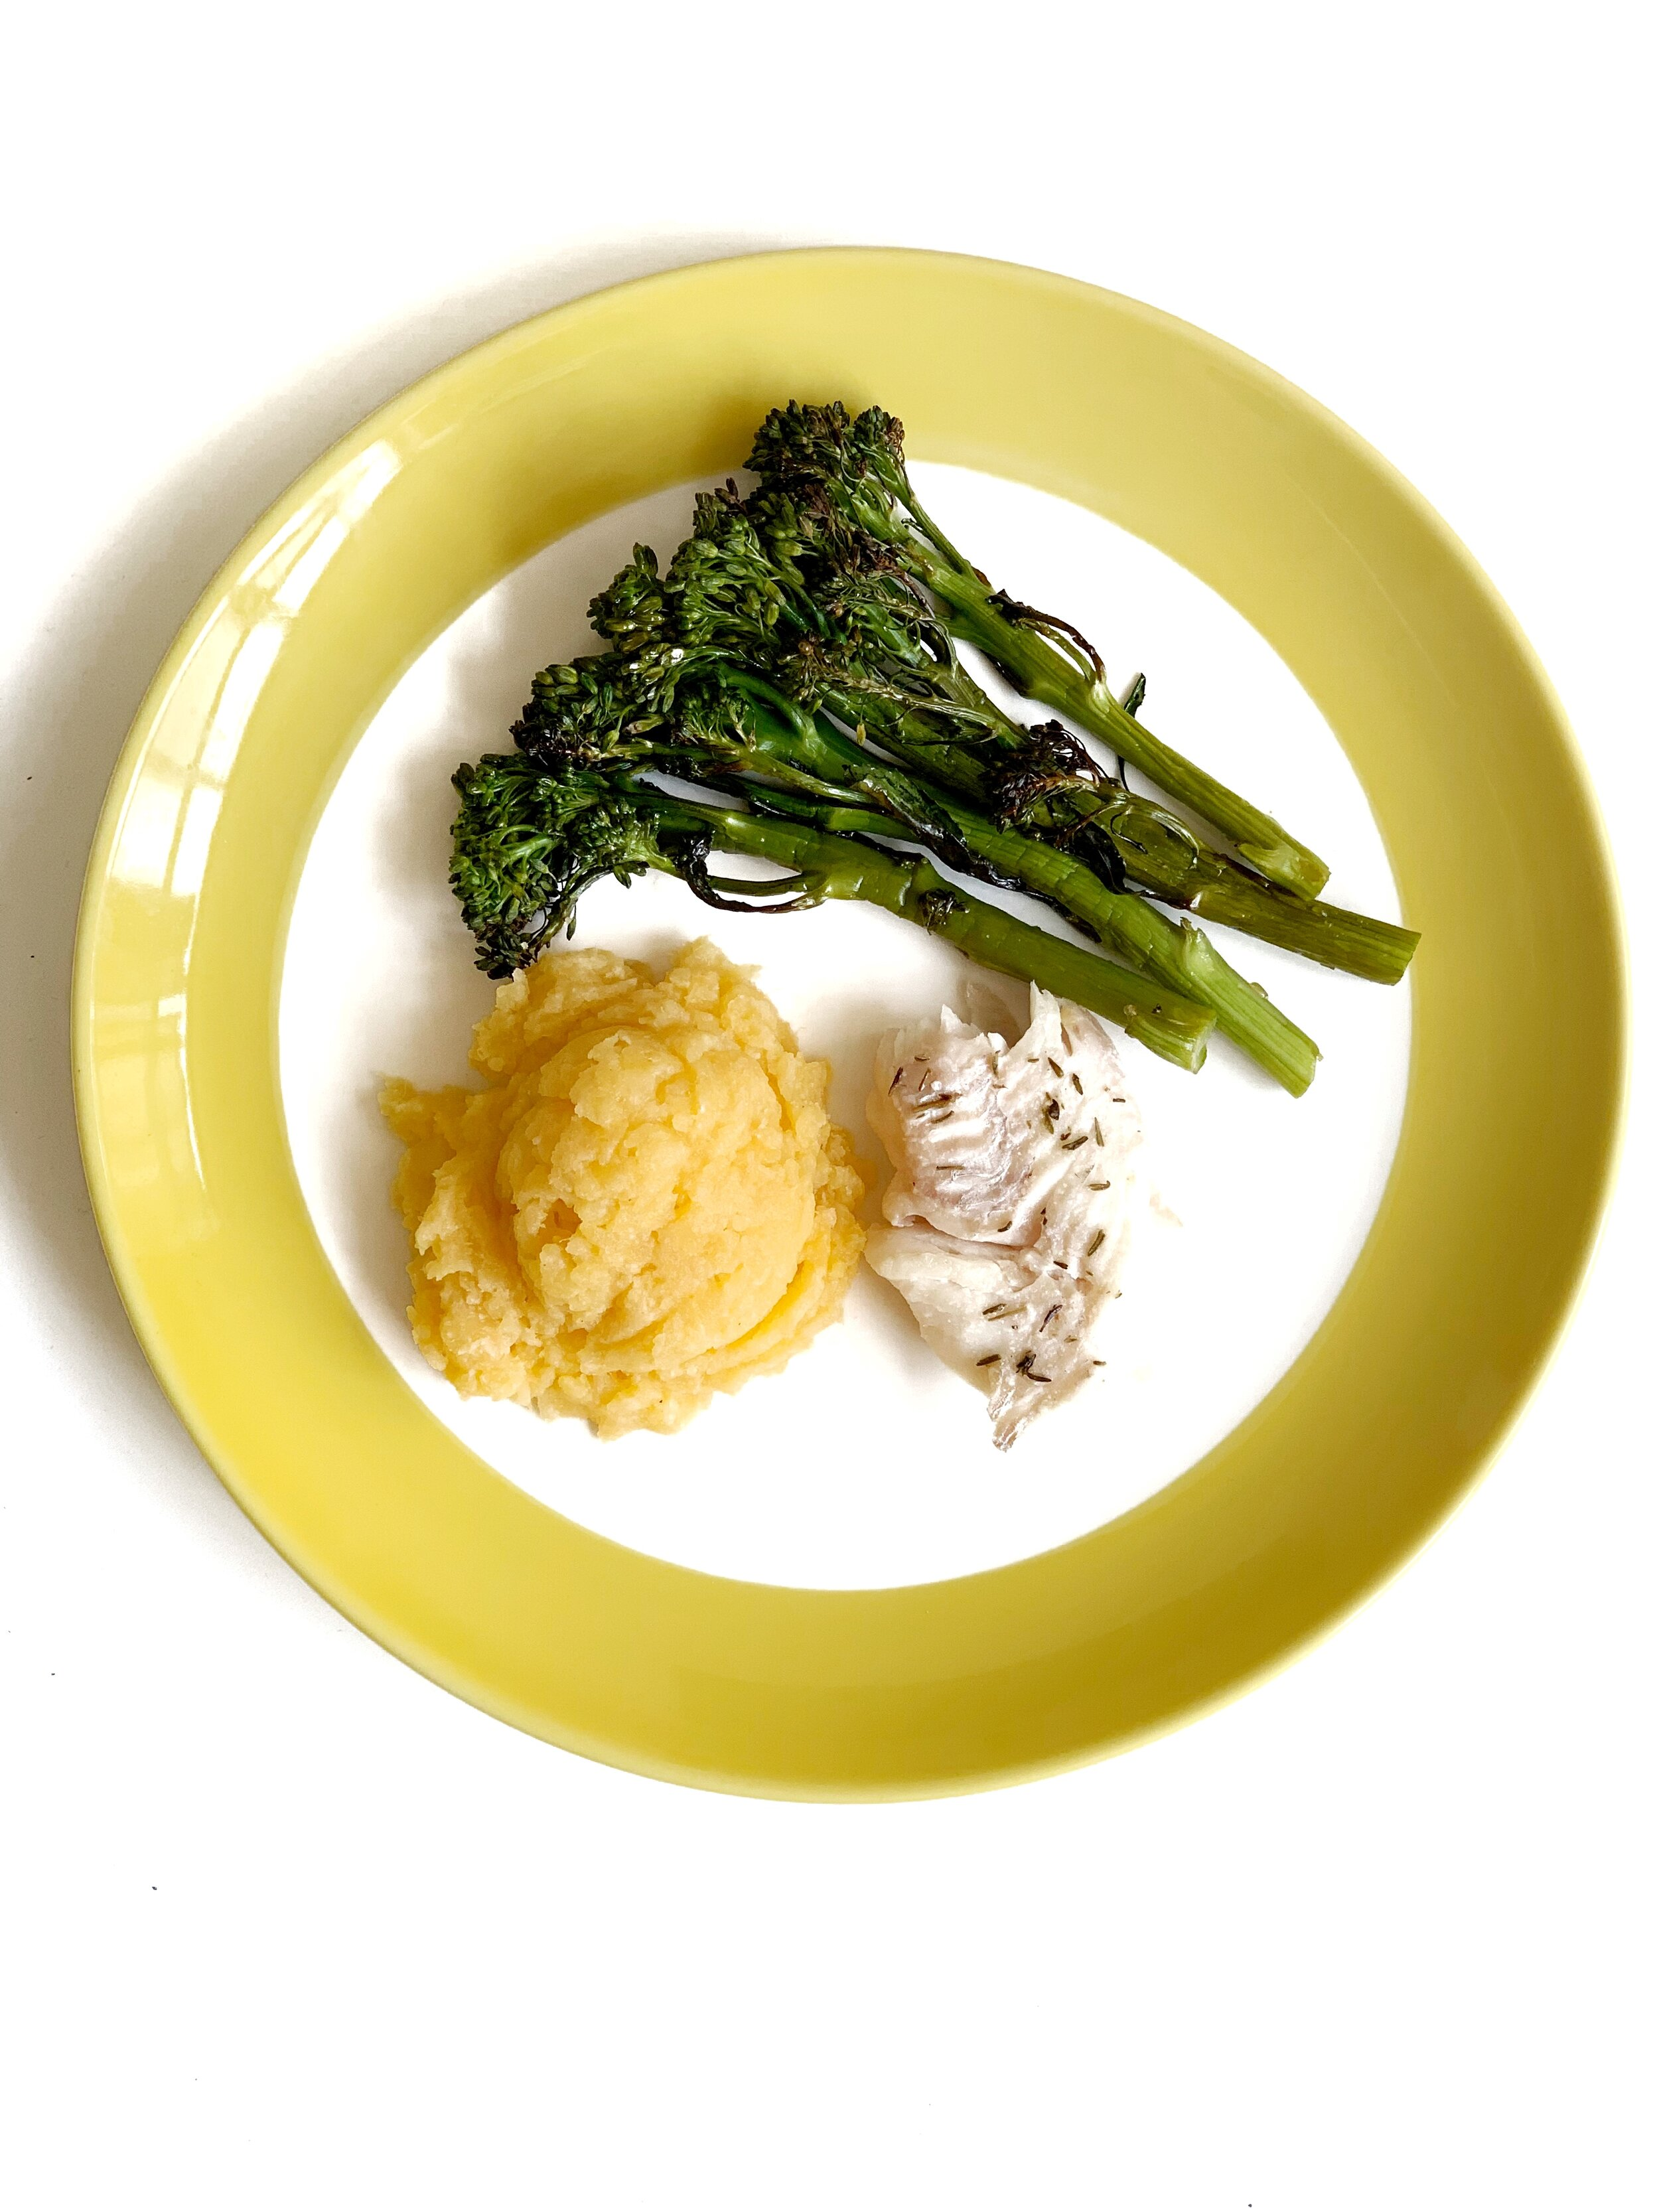 Crispy Thyme Haddock & Broccolini (AIP, GAPS, Gluten-Free, Dairy-Free, Paleo, Keto)